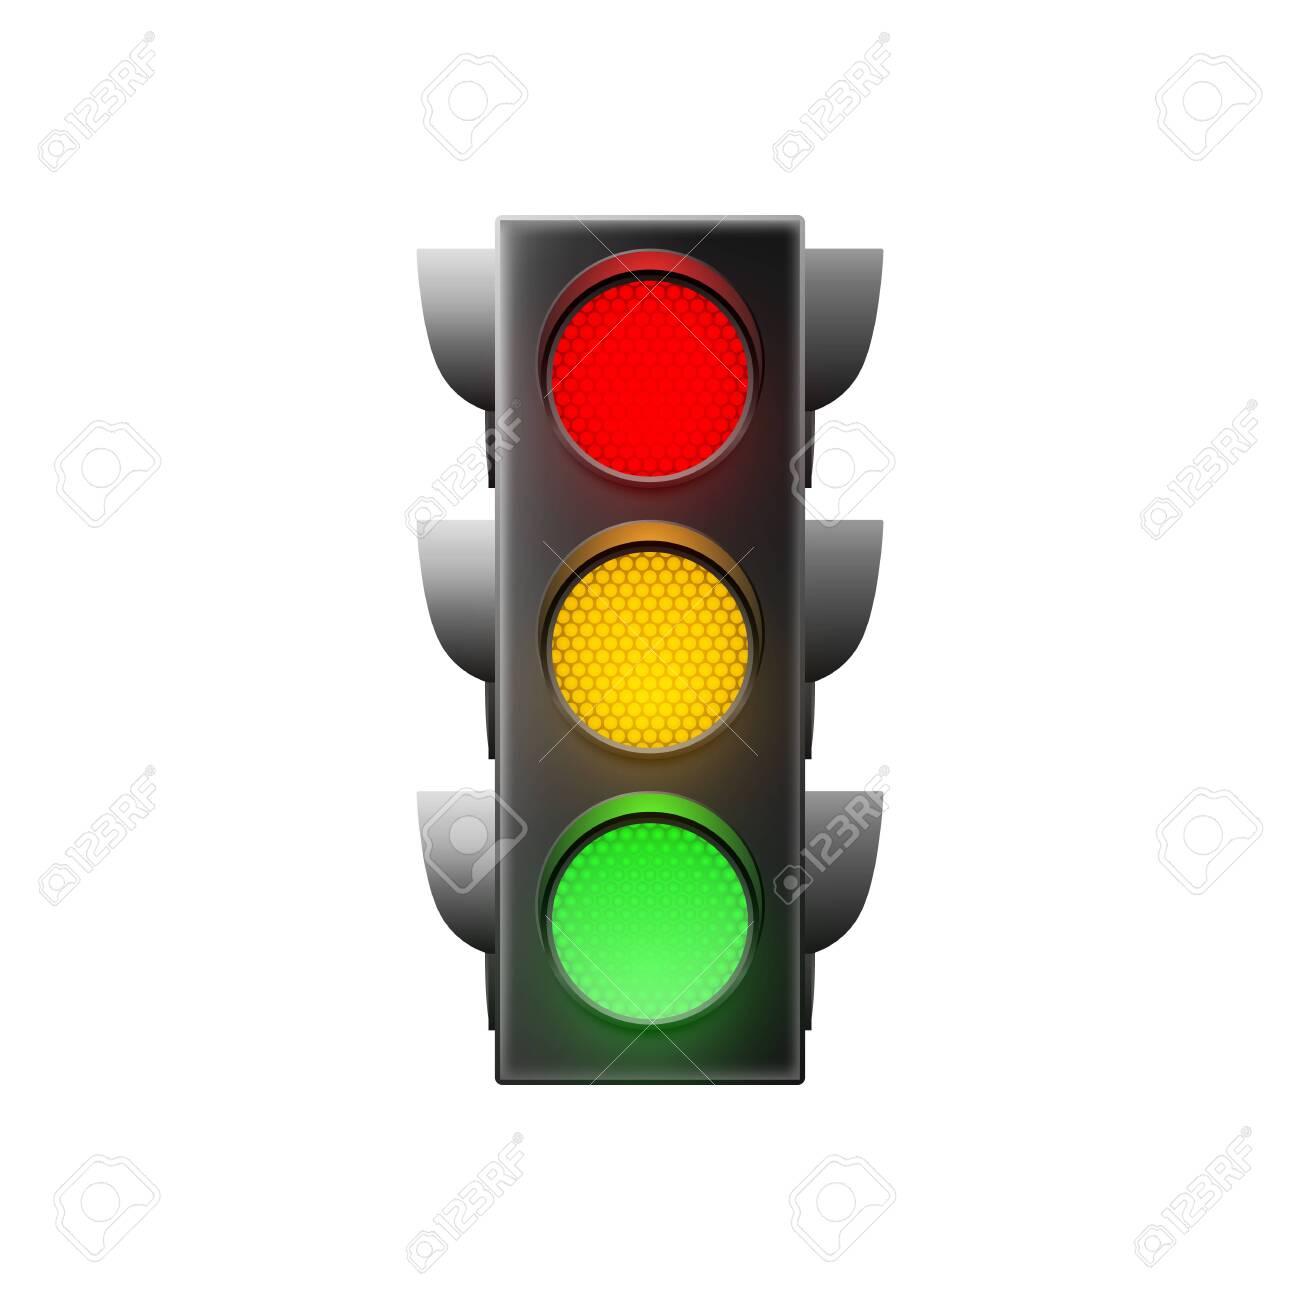 Traffic light isolated on white background. Vector illustration - 147625496